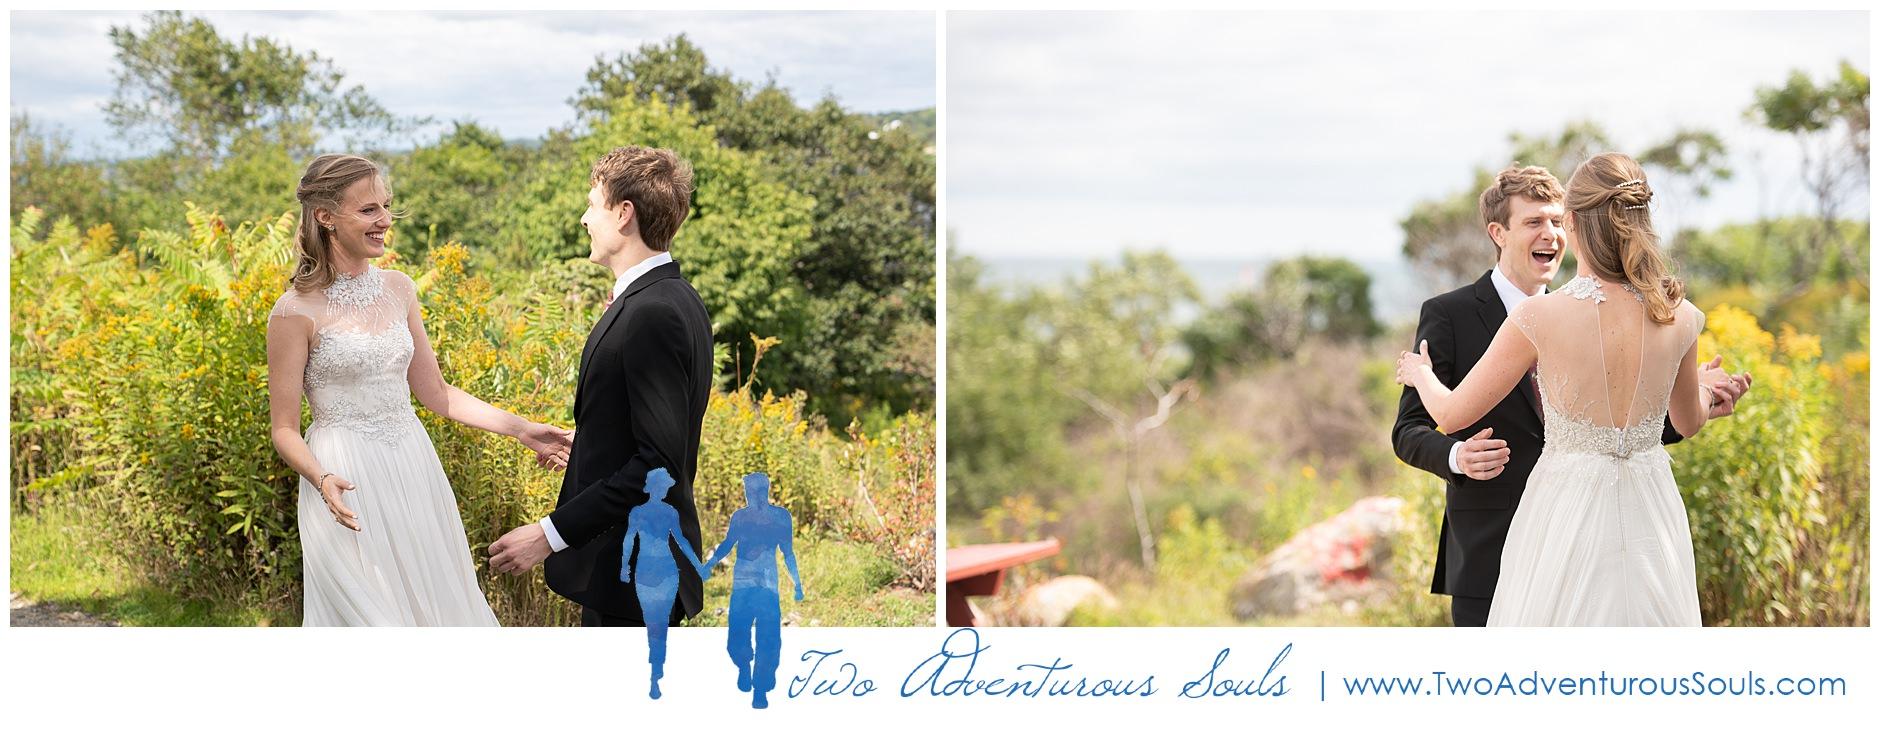 Grace Maine Photographers, Portland Maine Wedding Photographers, Two Adventurous Souls- 090719_0005.jpg